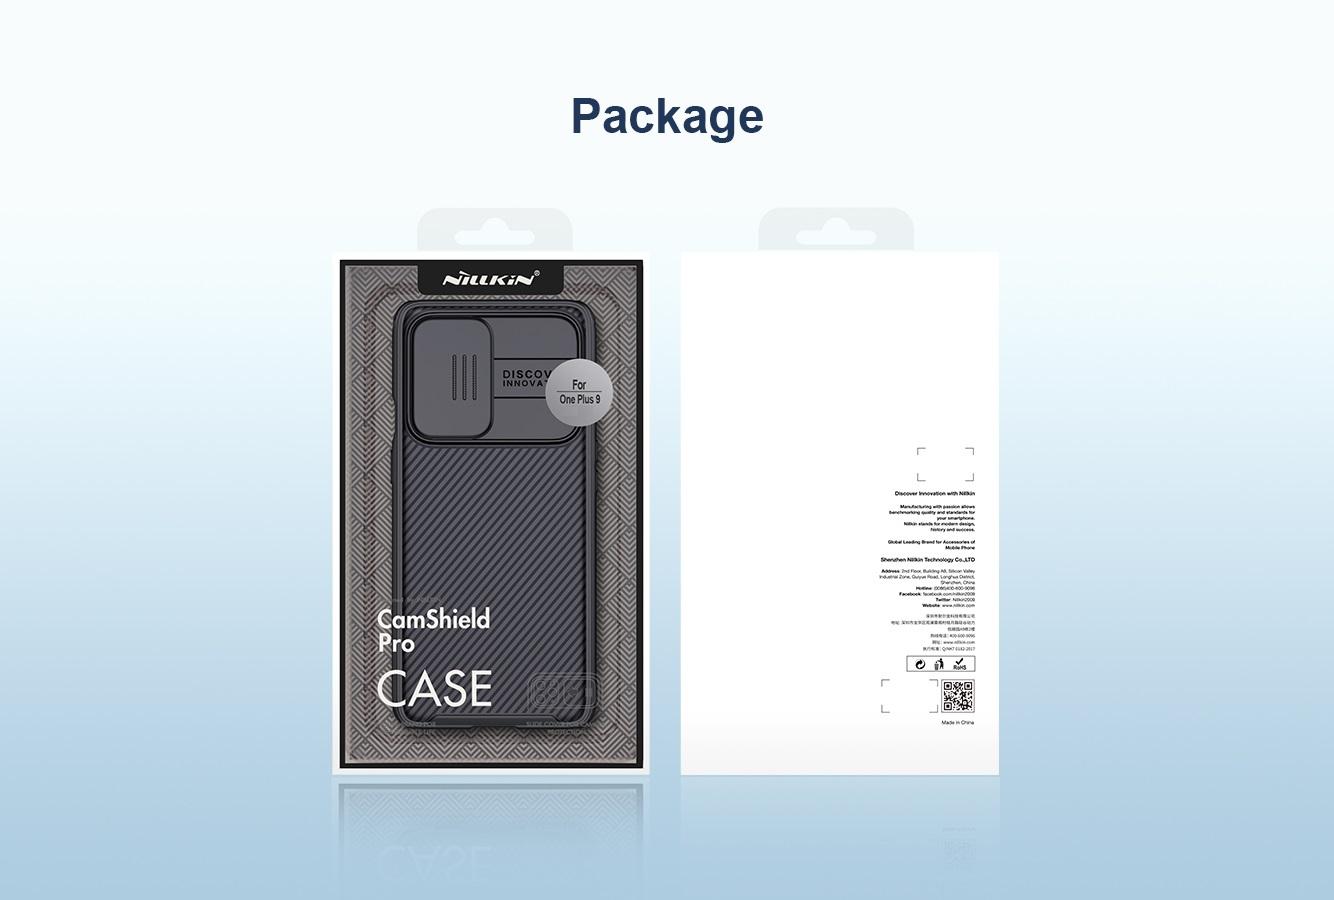 OnePlus_9_CamShield_Pro_Case-12.jpg